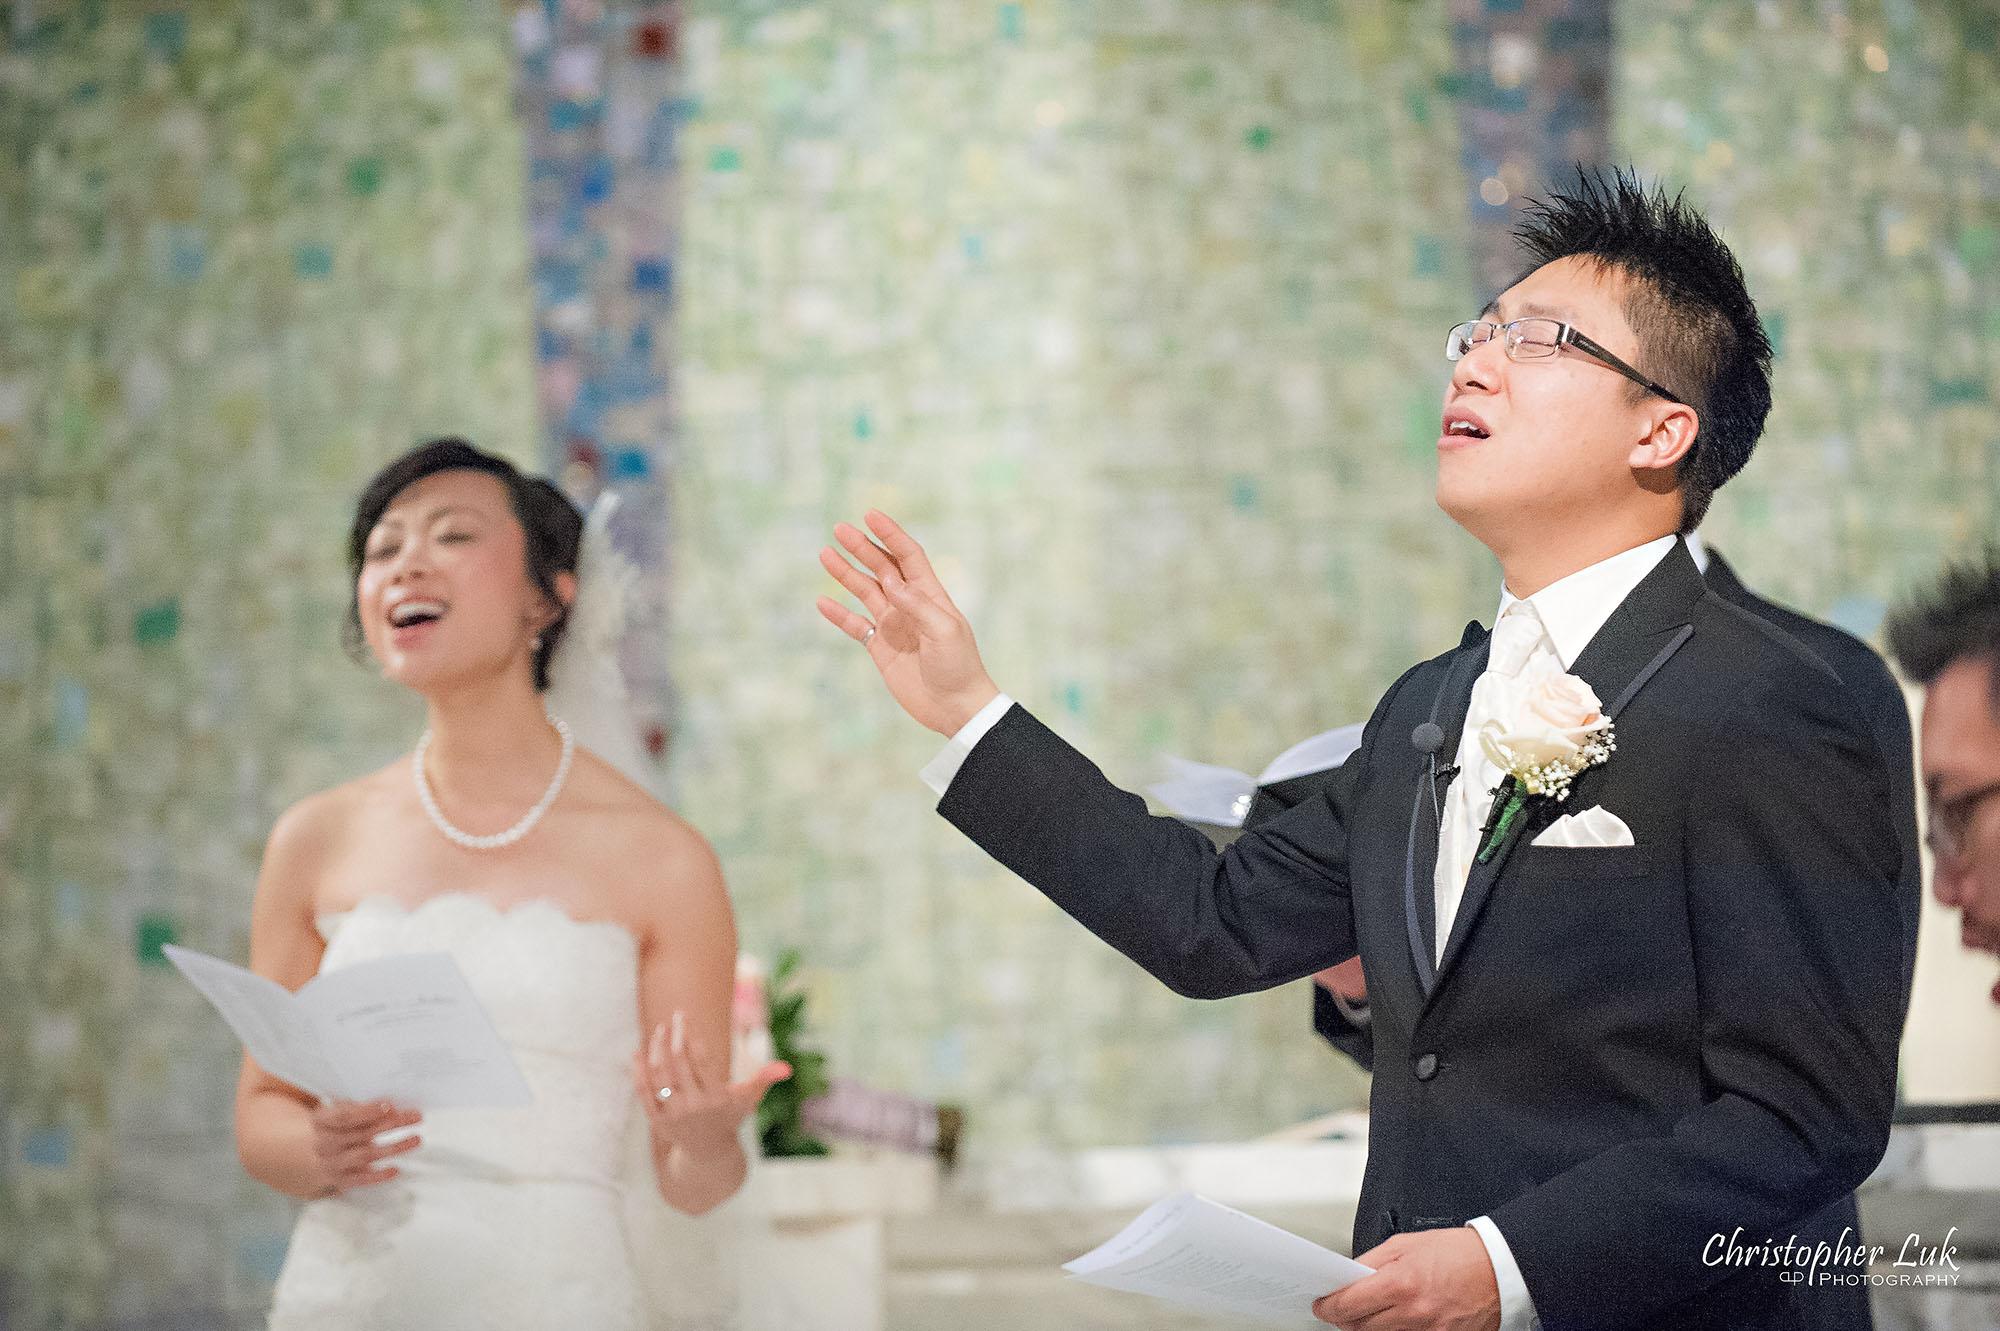 Christopher Luk Toronto Wedding Photography Tyndale Chapel Church Ceremony Venue Location Bride Groom Altar Worship Singing Together